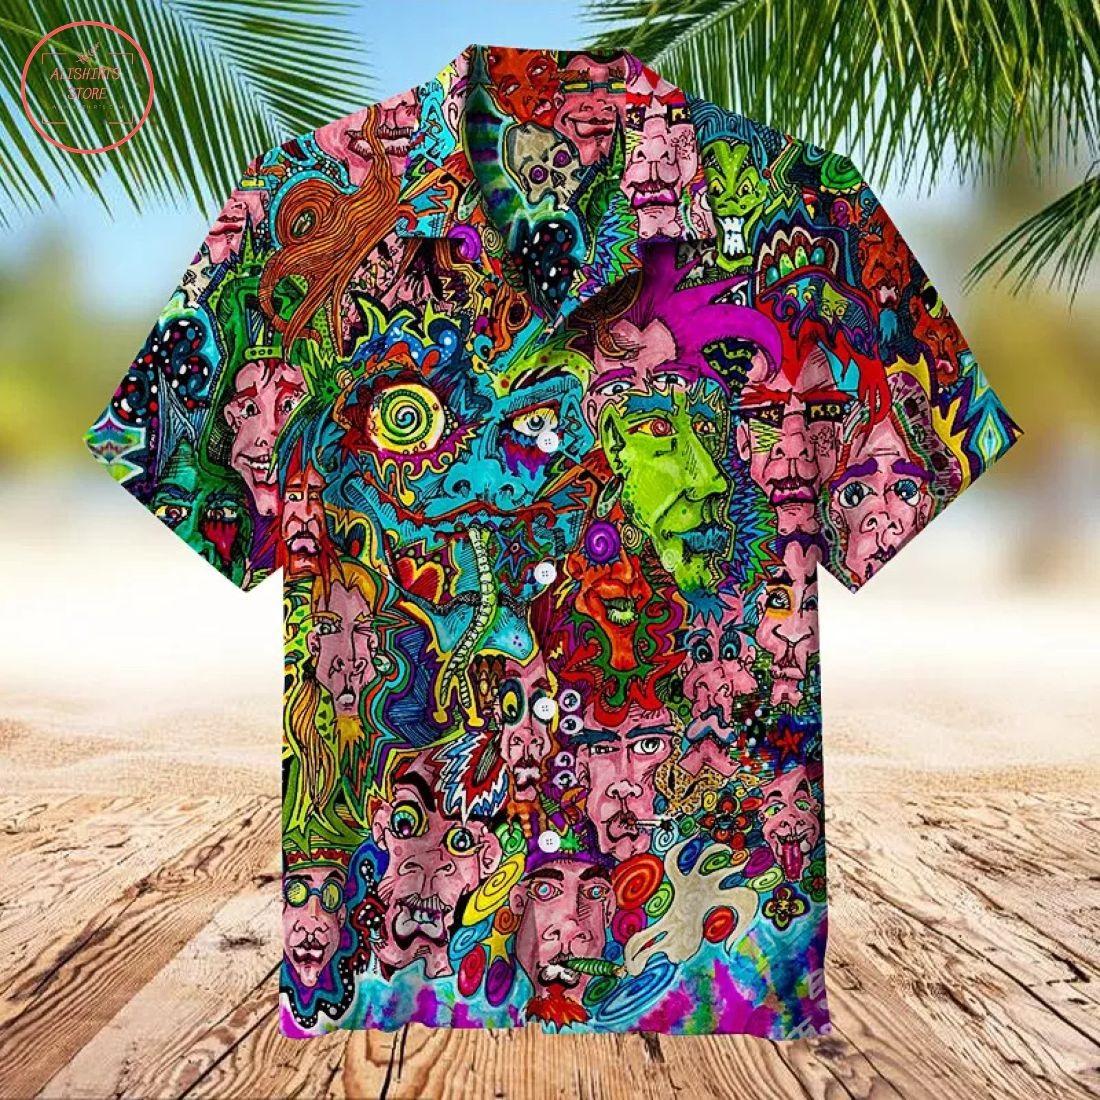 Psychedelic Tye Dye Hawaiian Shirt